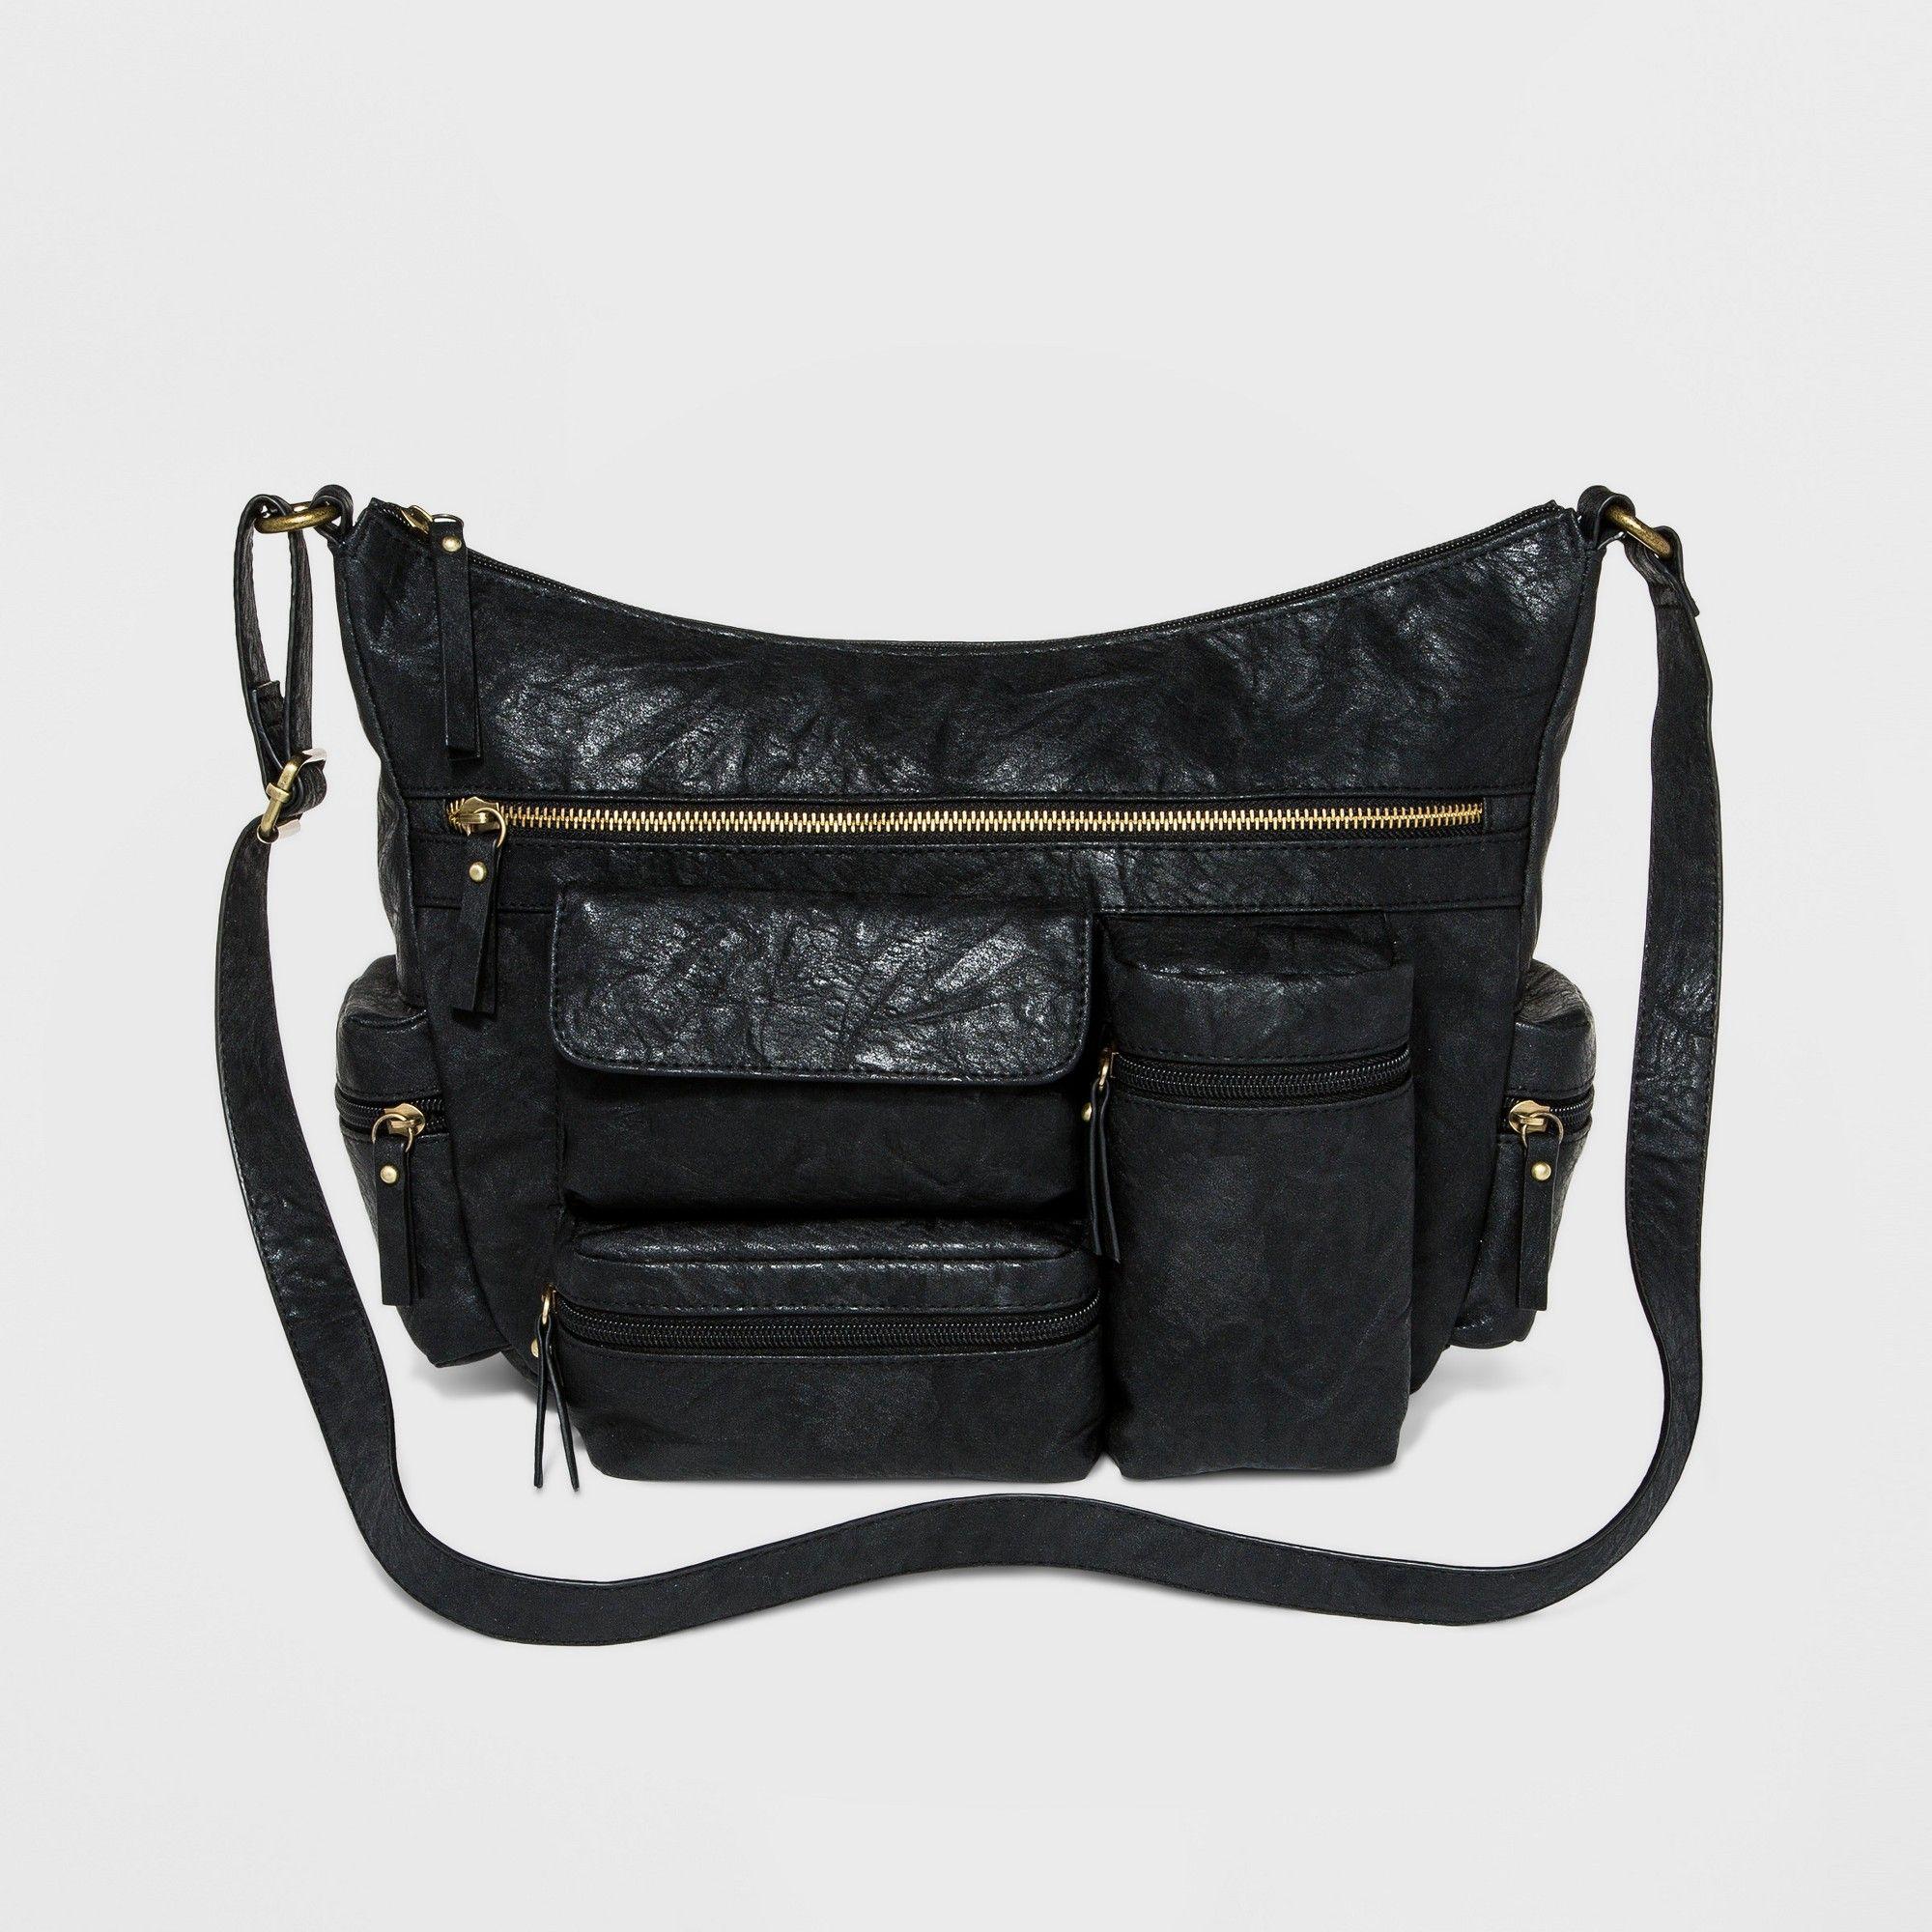 0c2d42a48ff Women's Veg Tan Hobo Bags - Bueno of California Black | Products ...